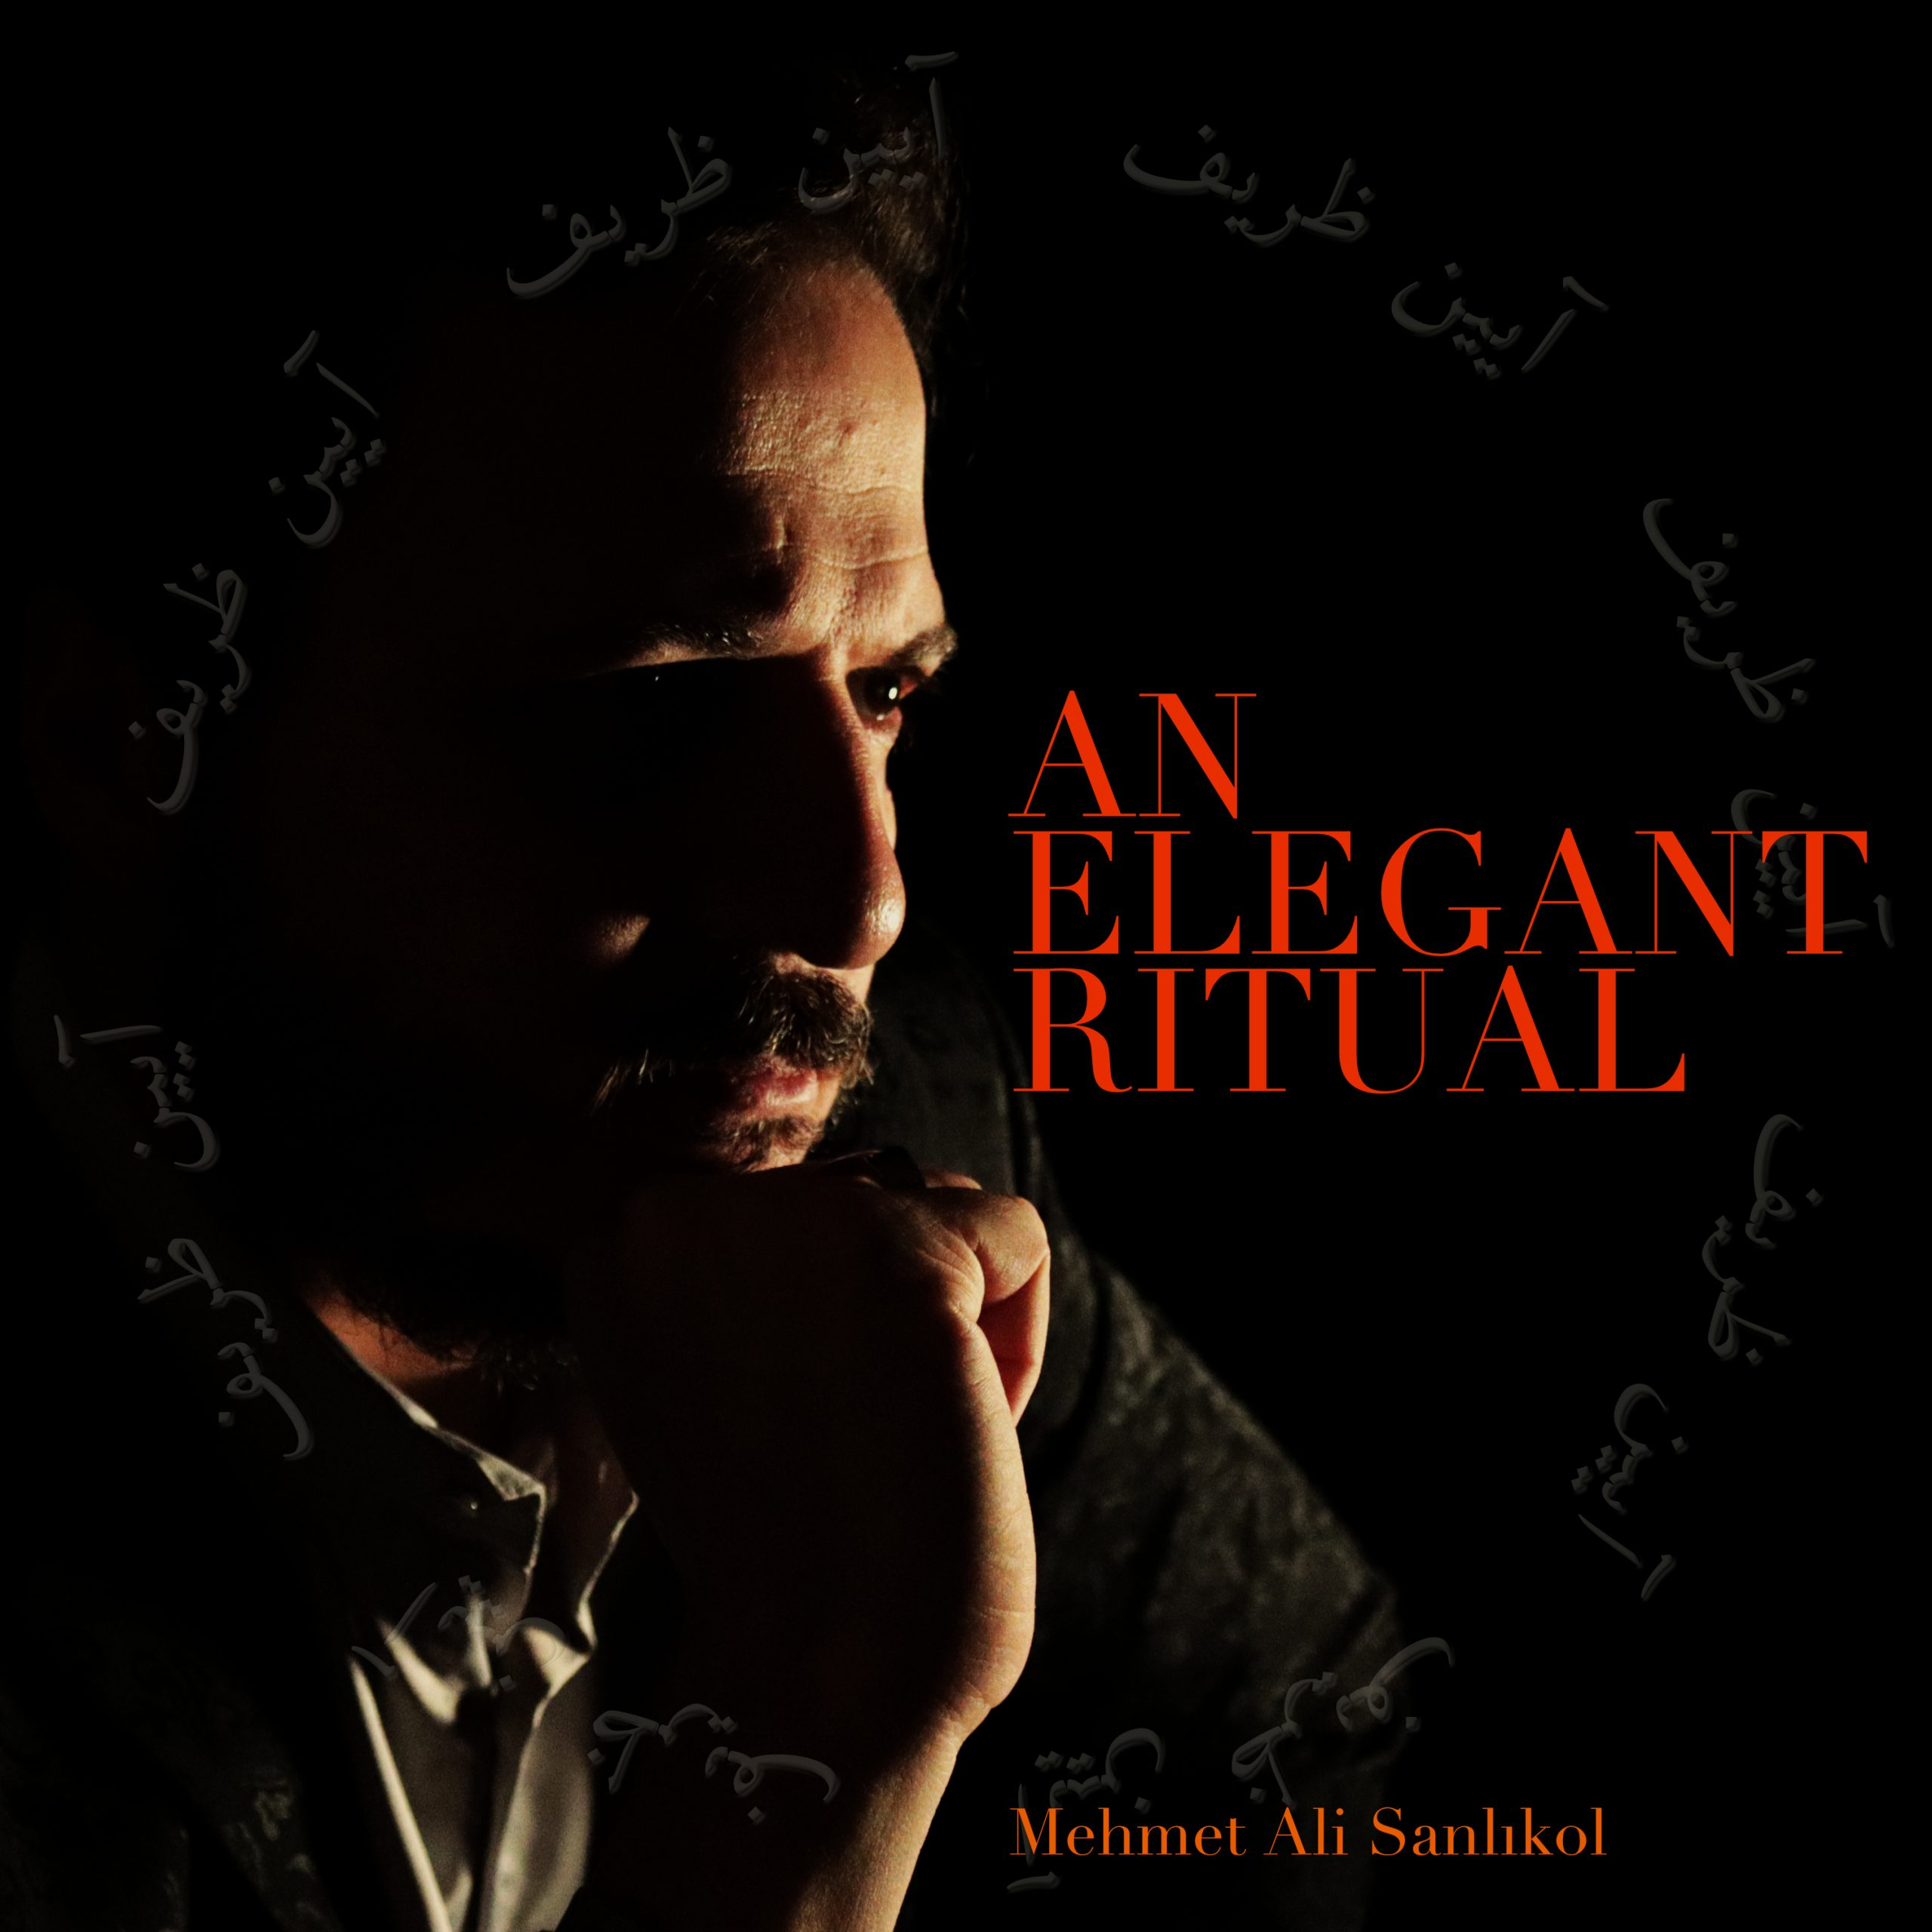 PODCAST: Mehmet Ali Sanlikol Discusses New Album 'An Elegant Ritual' – WBUR Radio Boston